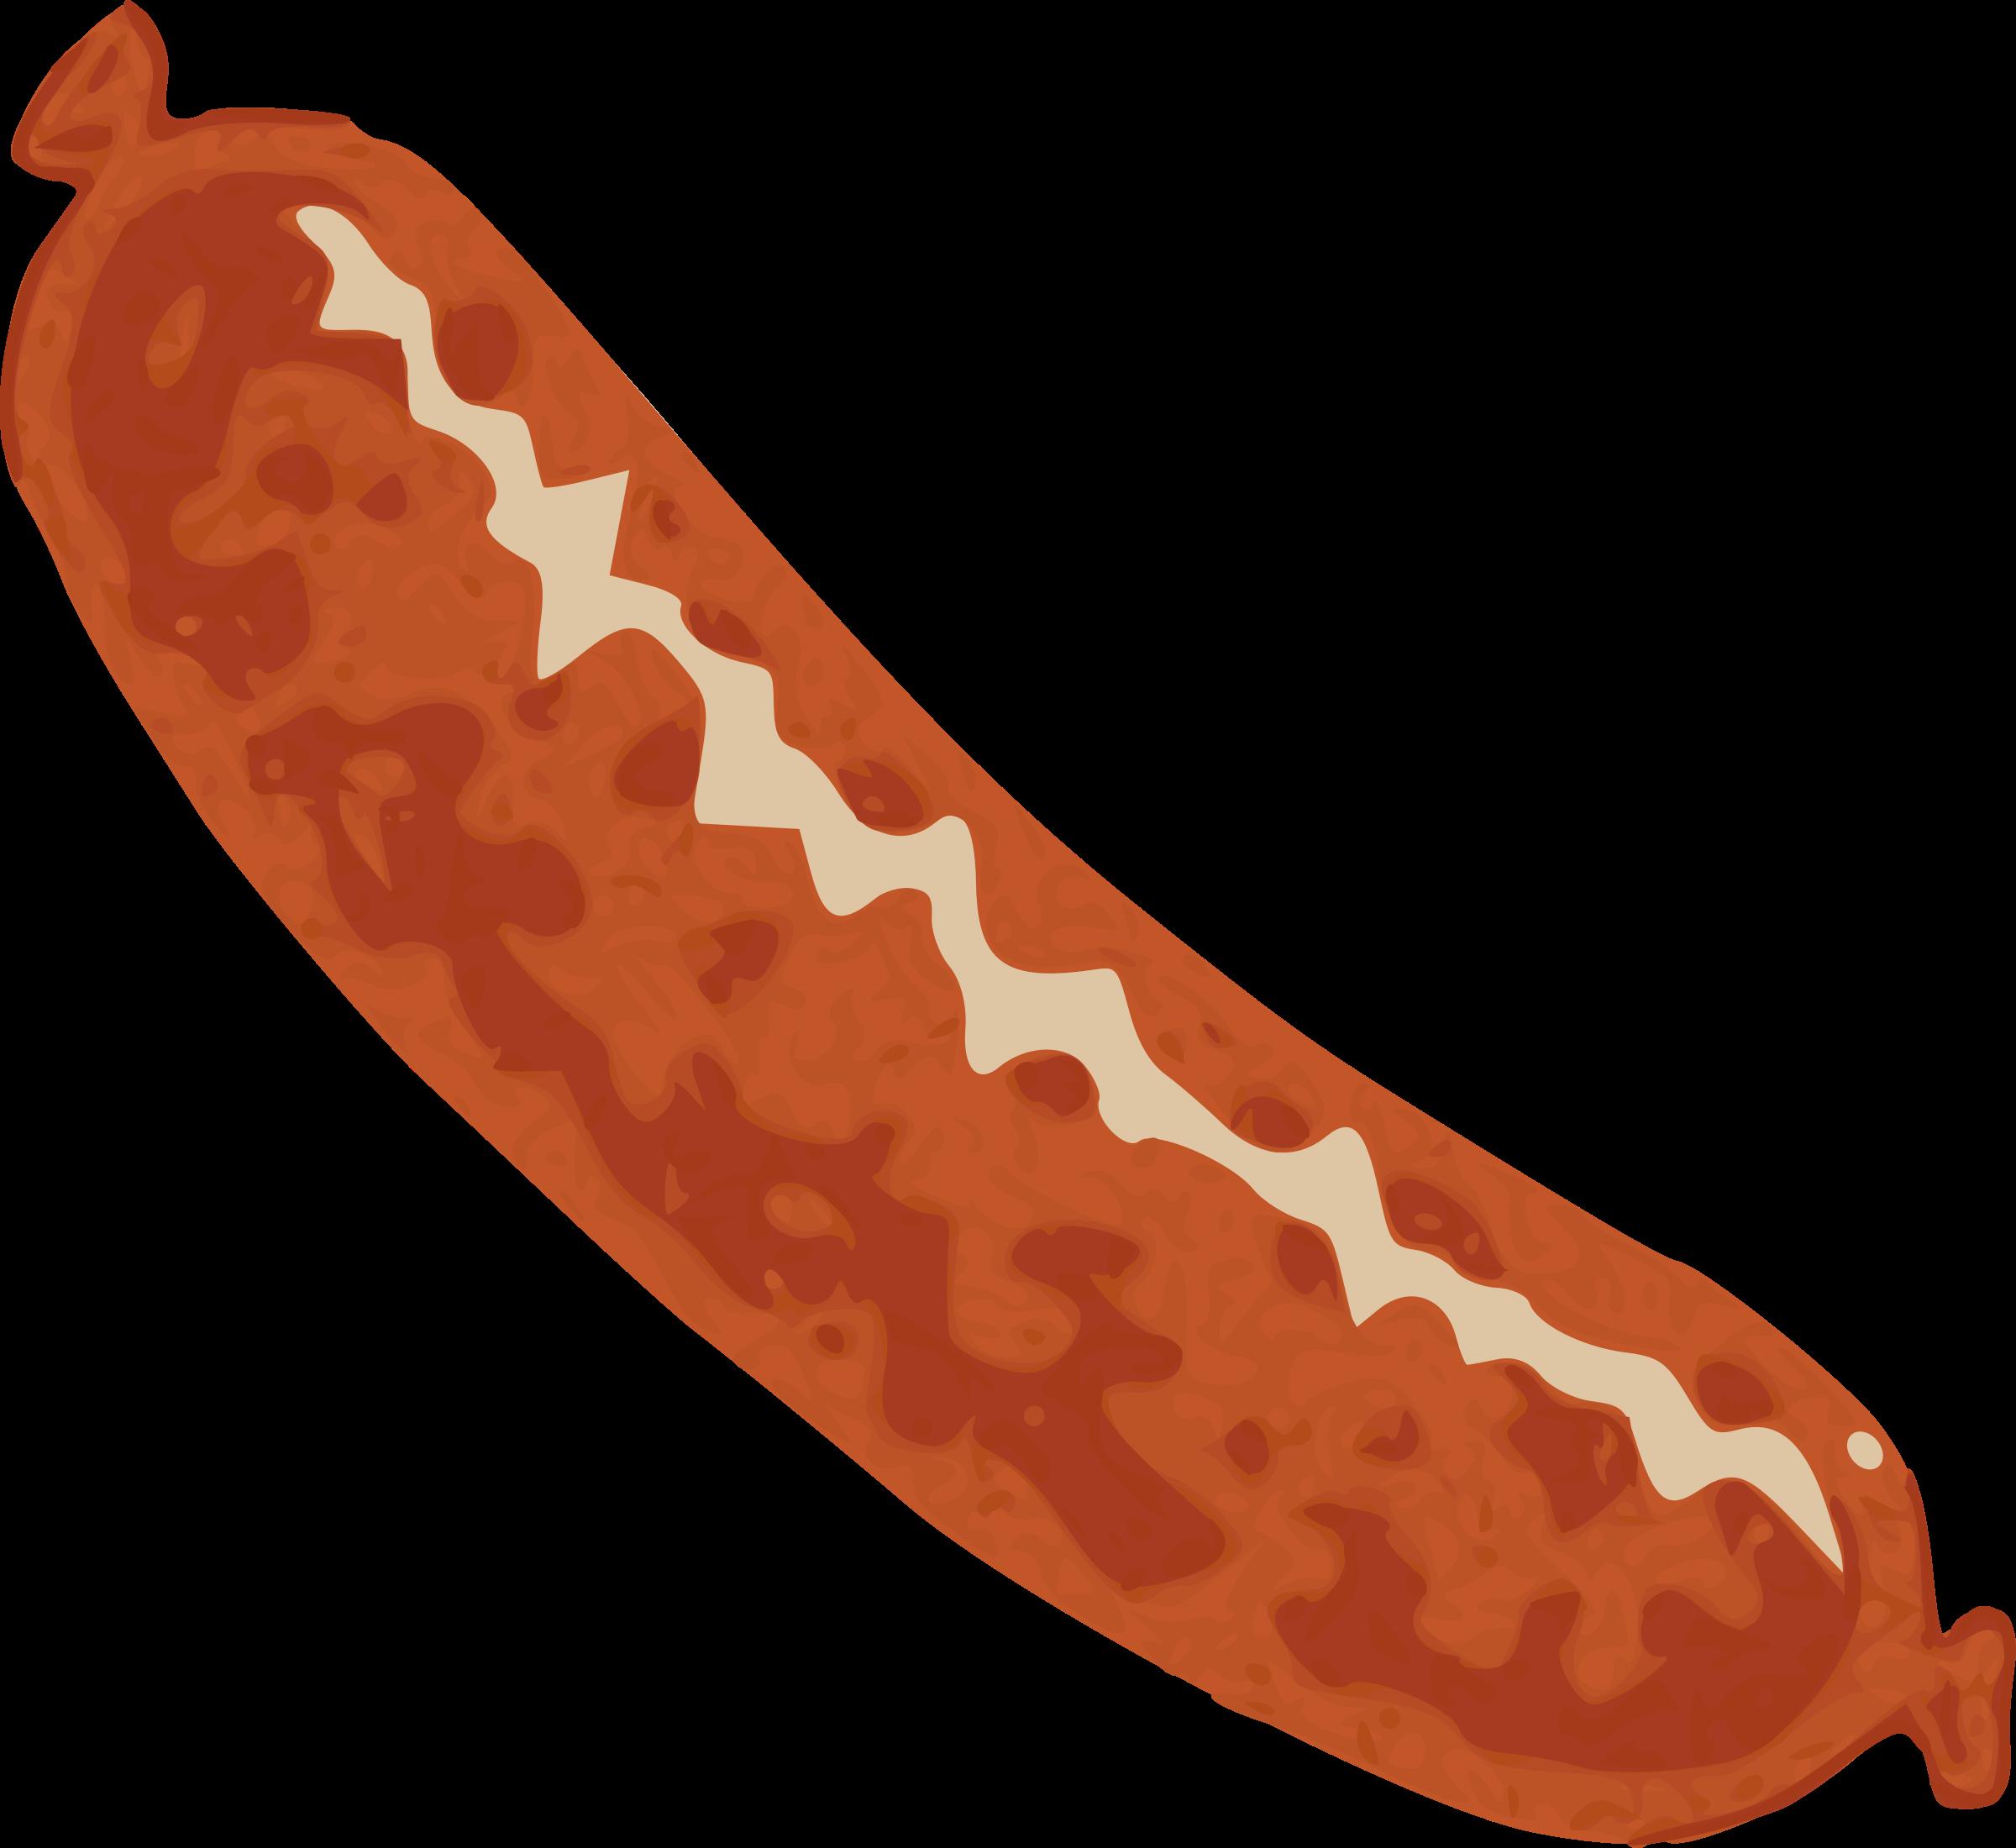 BIG IMAGE (PNG) - Sausage HD PNG